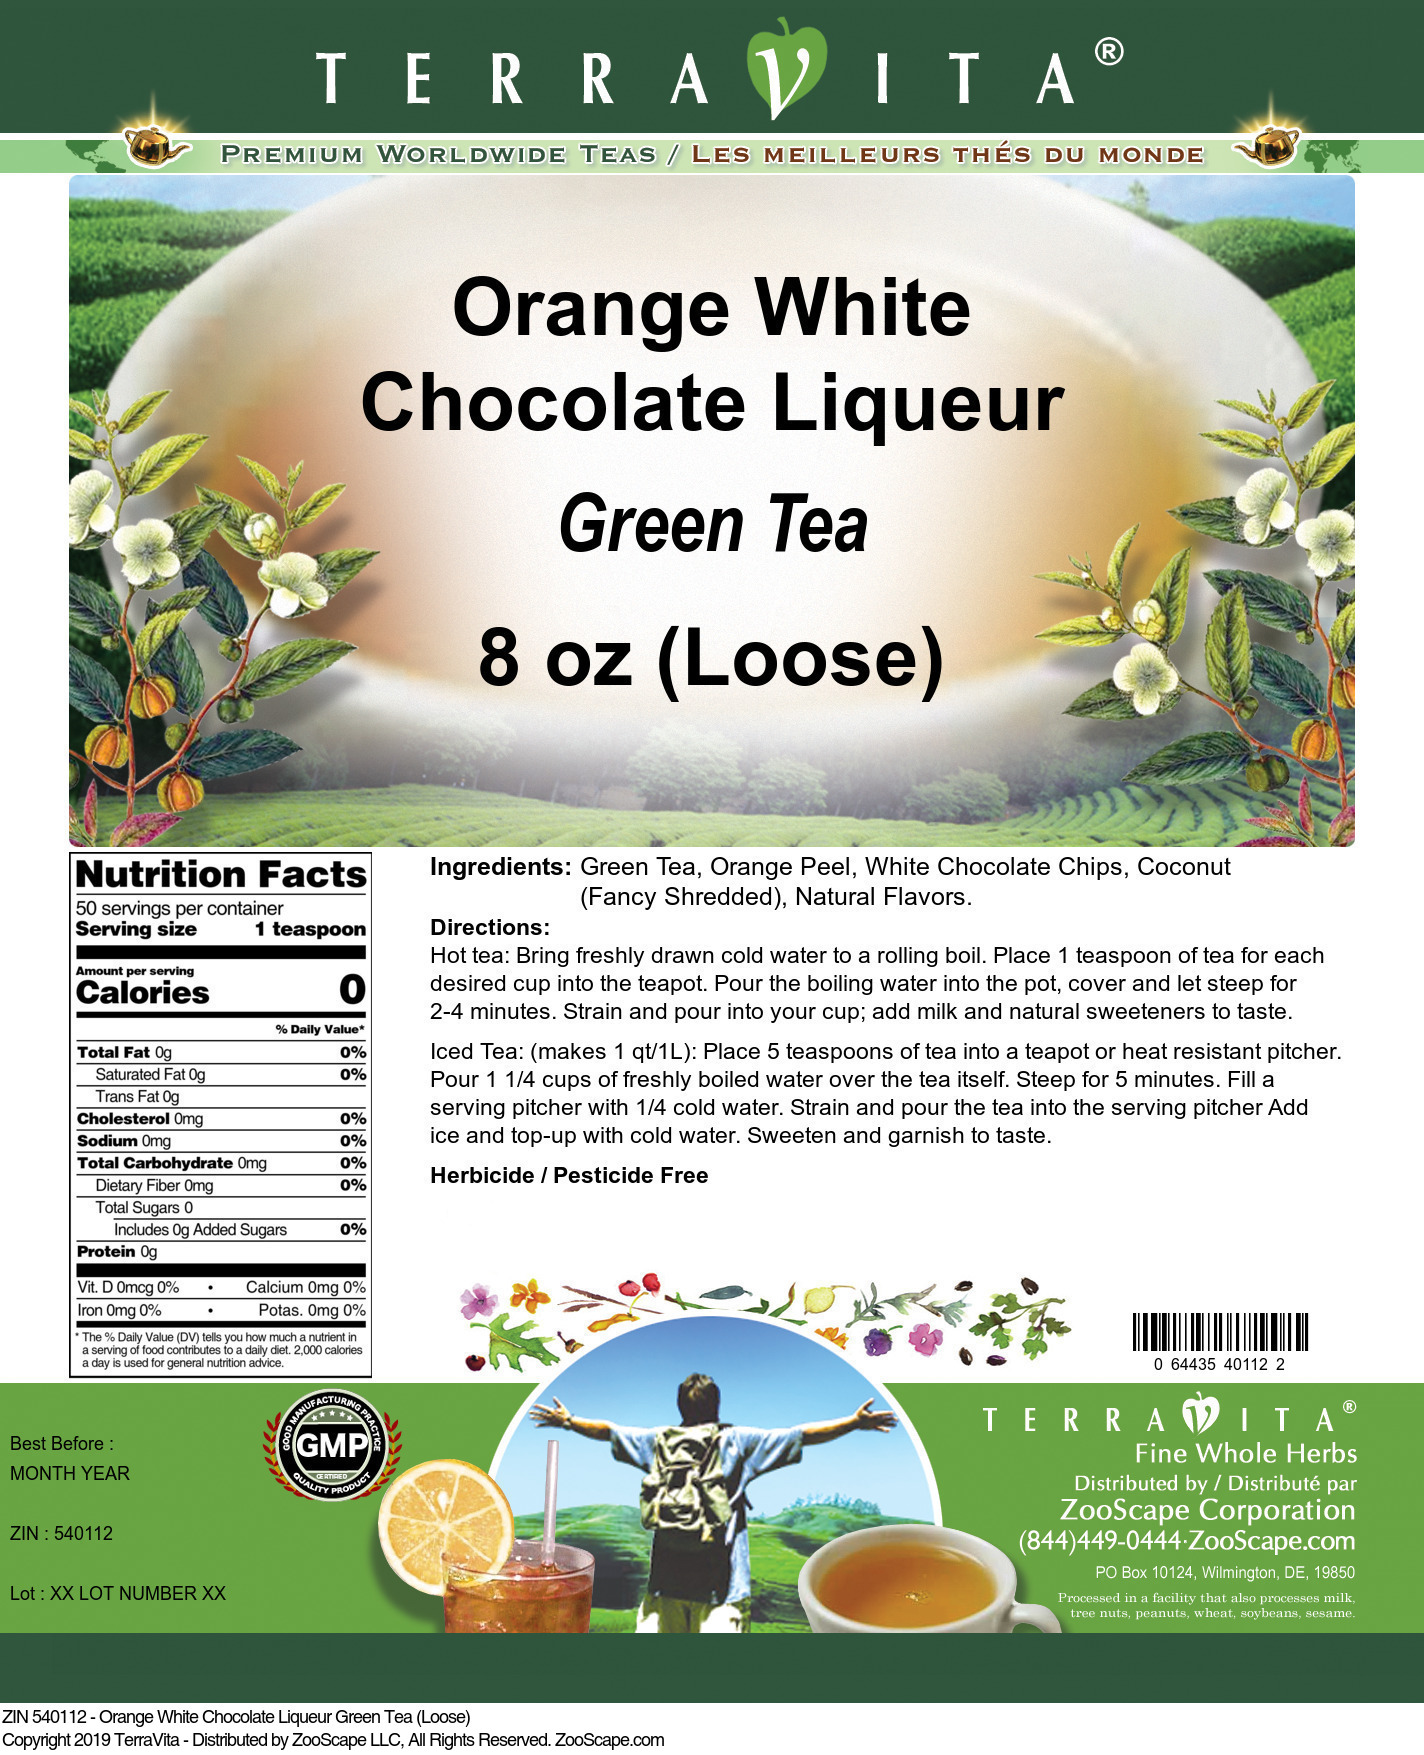 Orange White Chocolate Liqueur Green Tea (Loose)